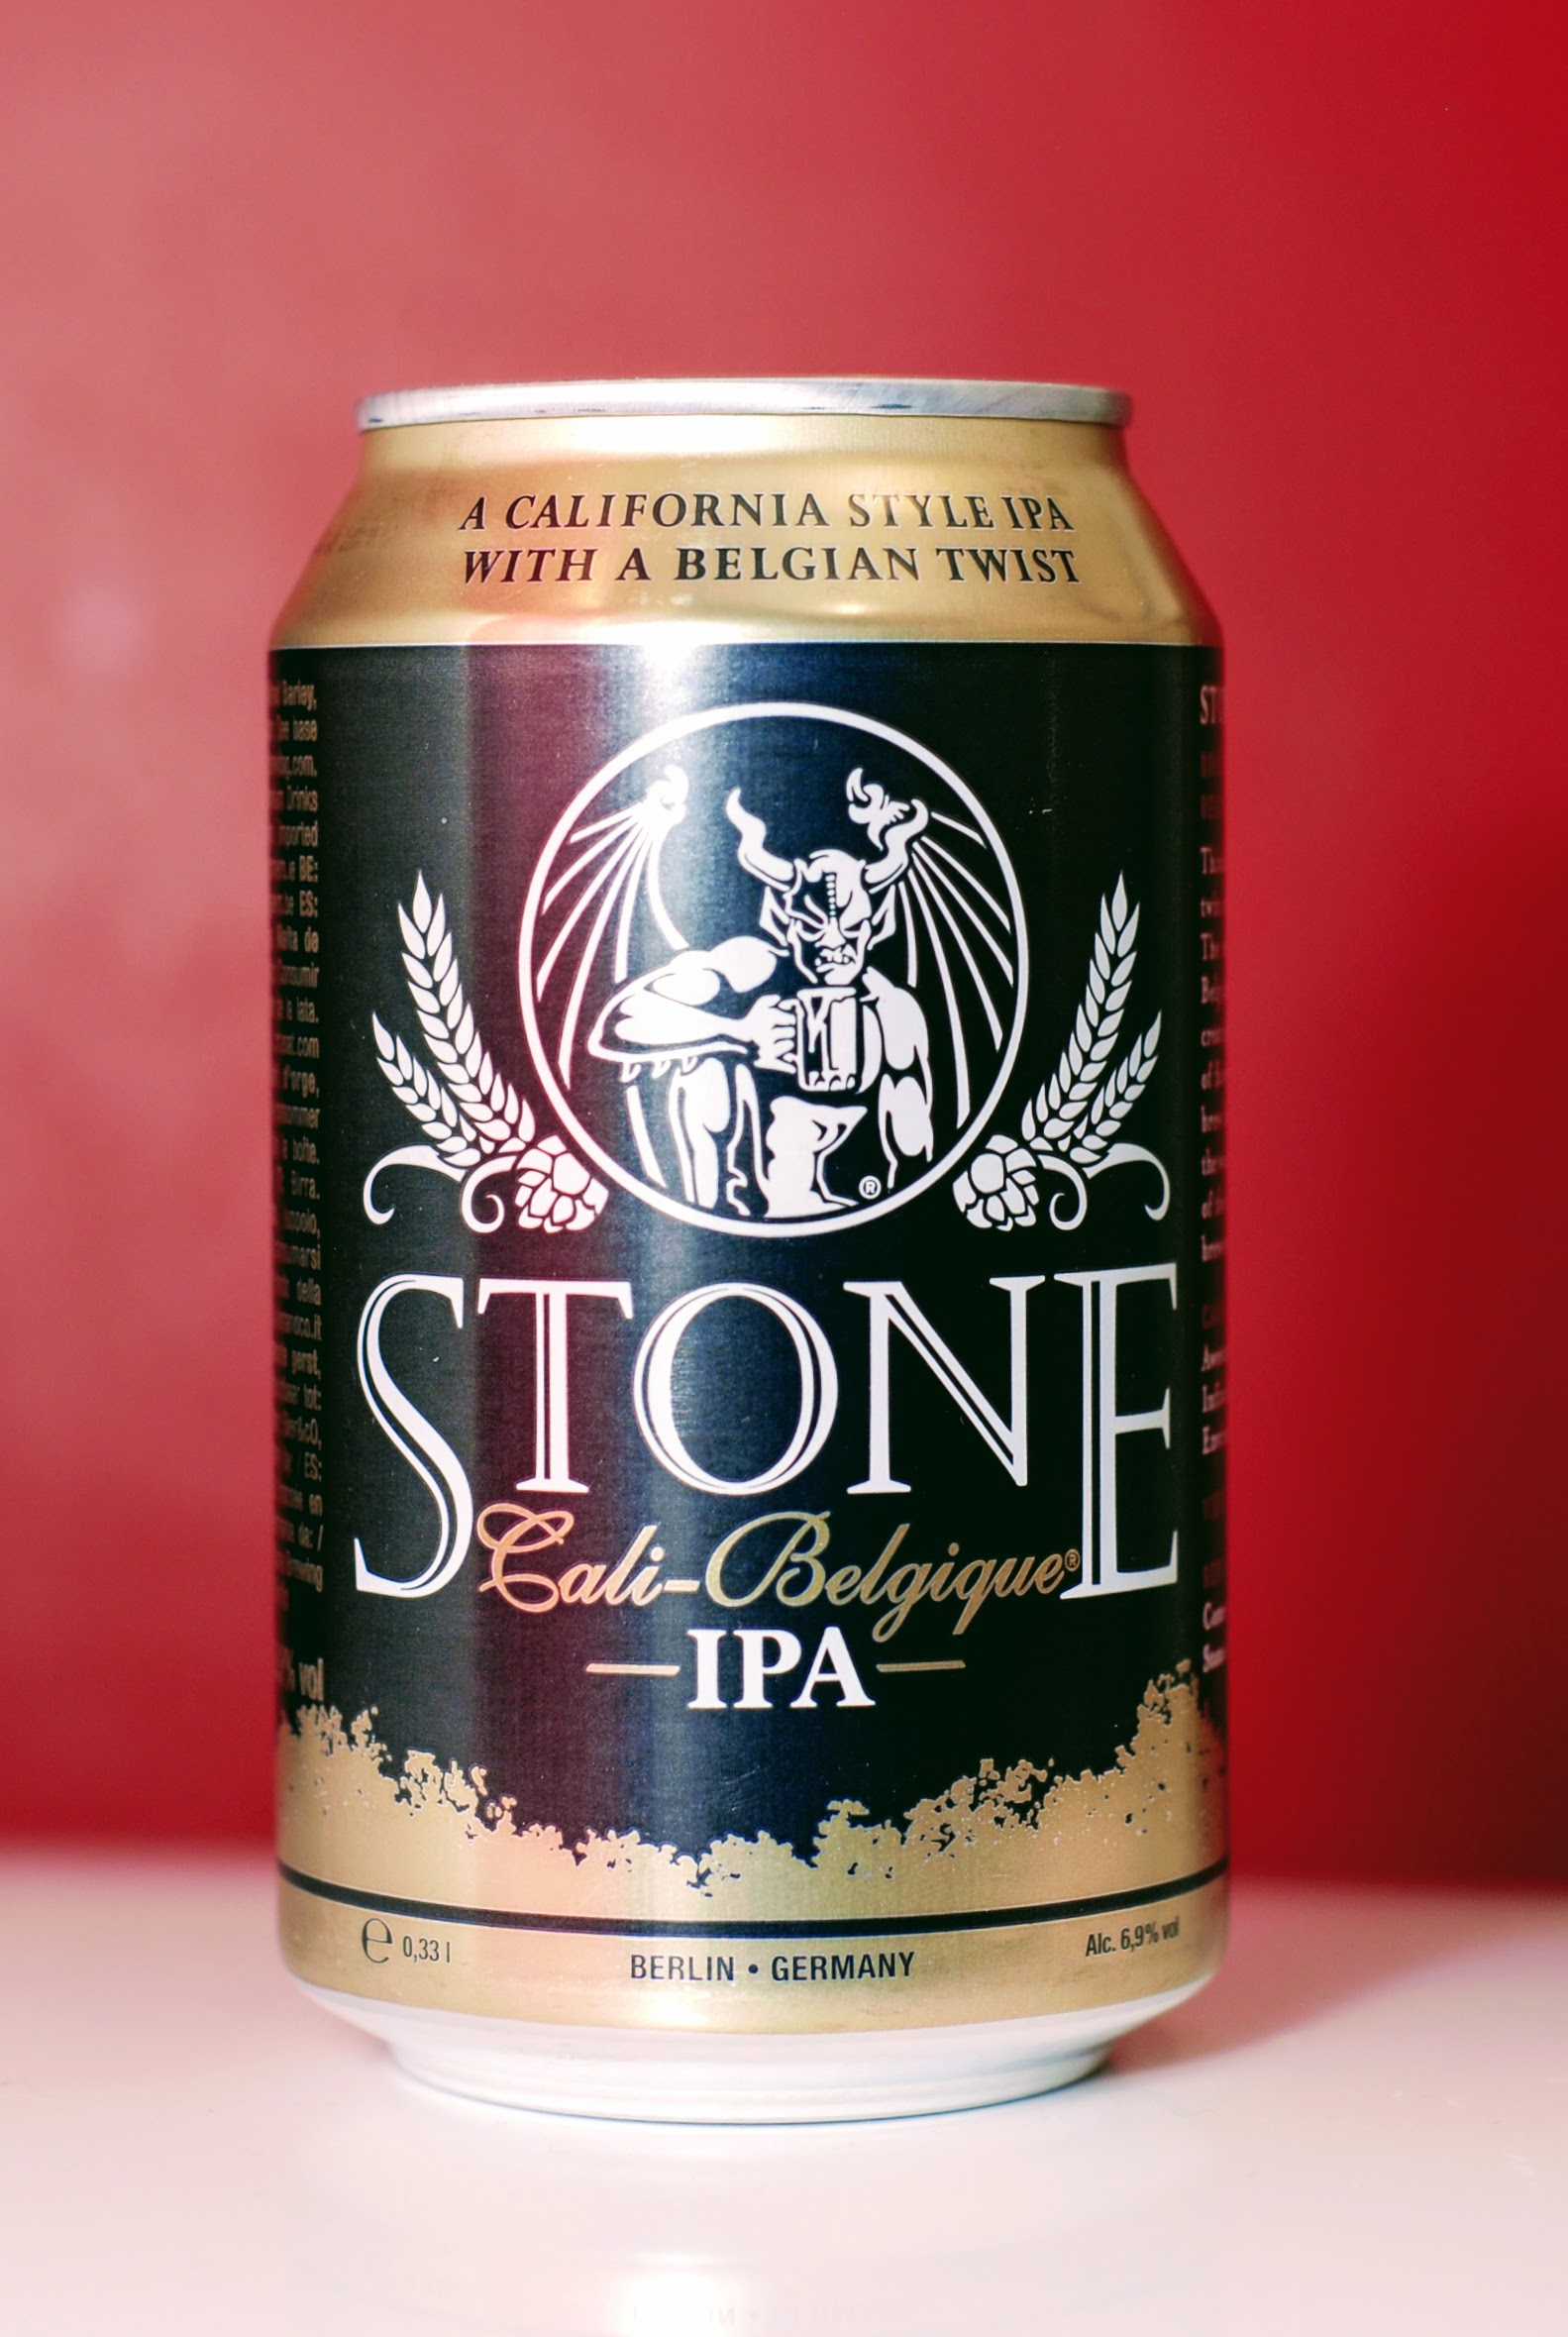 Stone Brewing, Cali-Belgique IPA